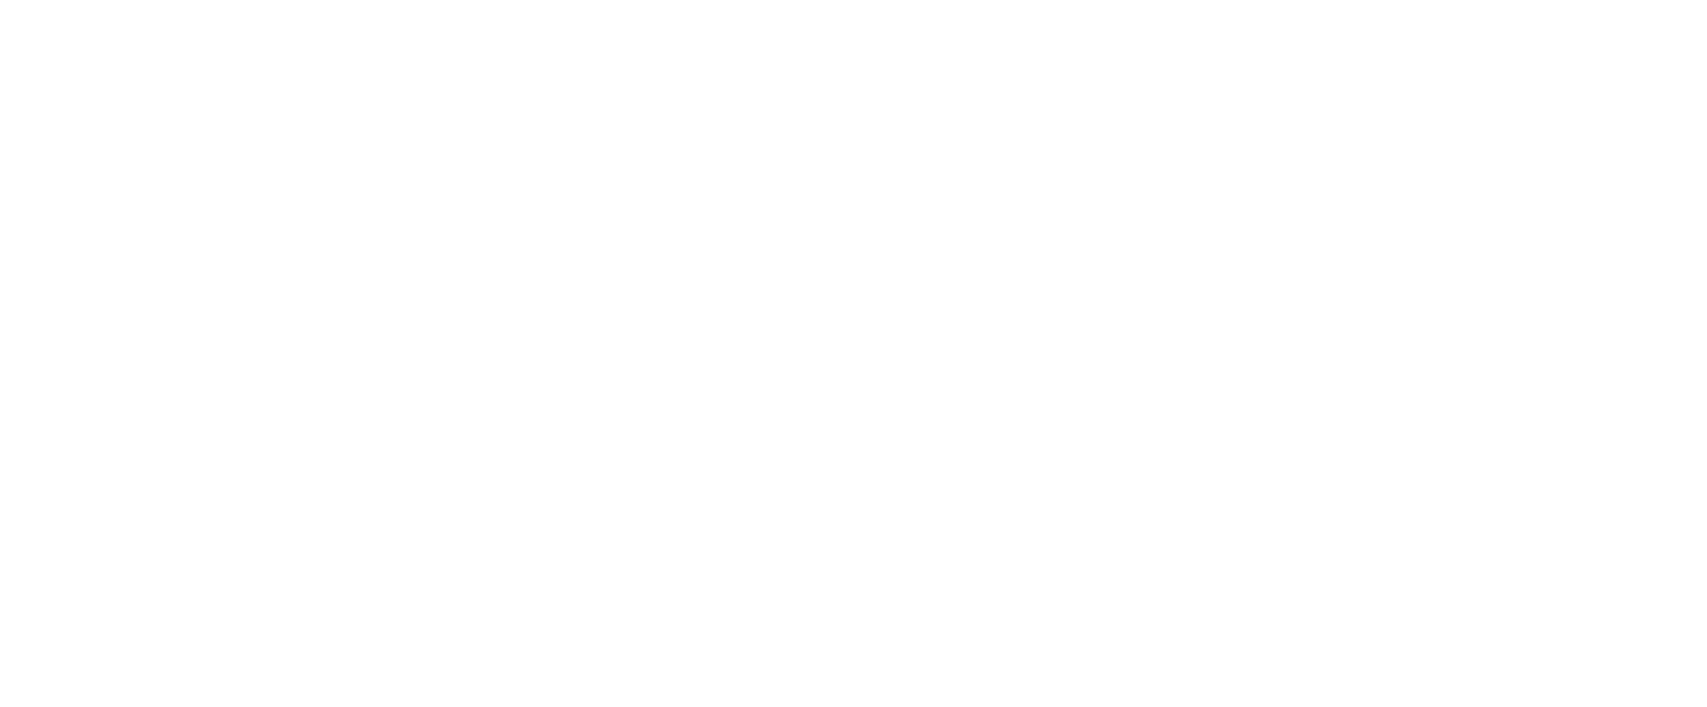 T.H.S タダヒロ商会|道南・函館・水中撮影・空撮・水中ドローン